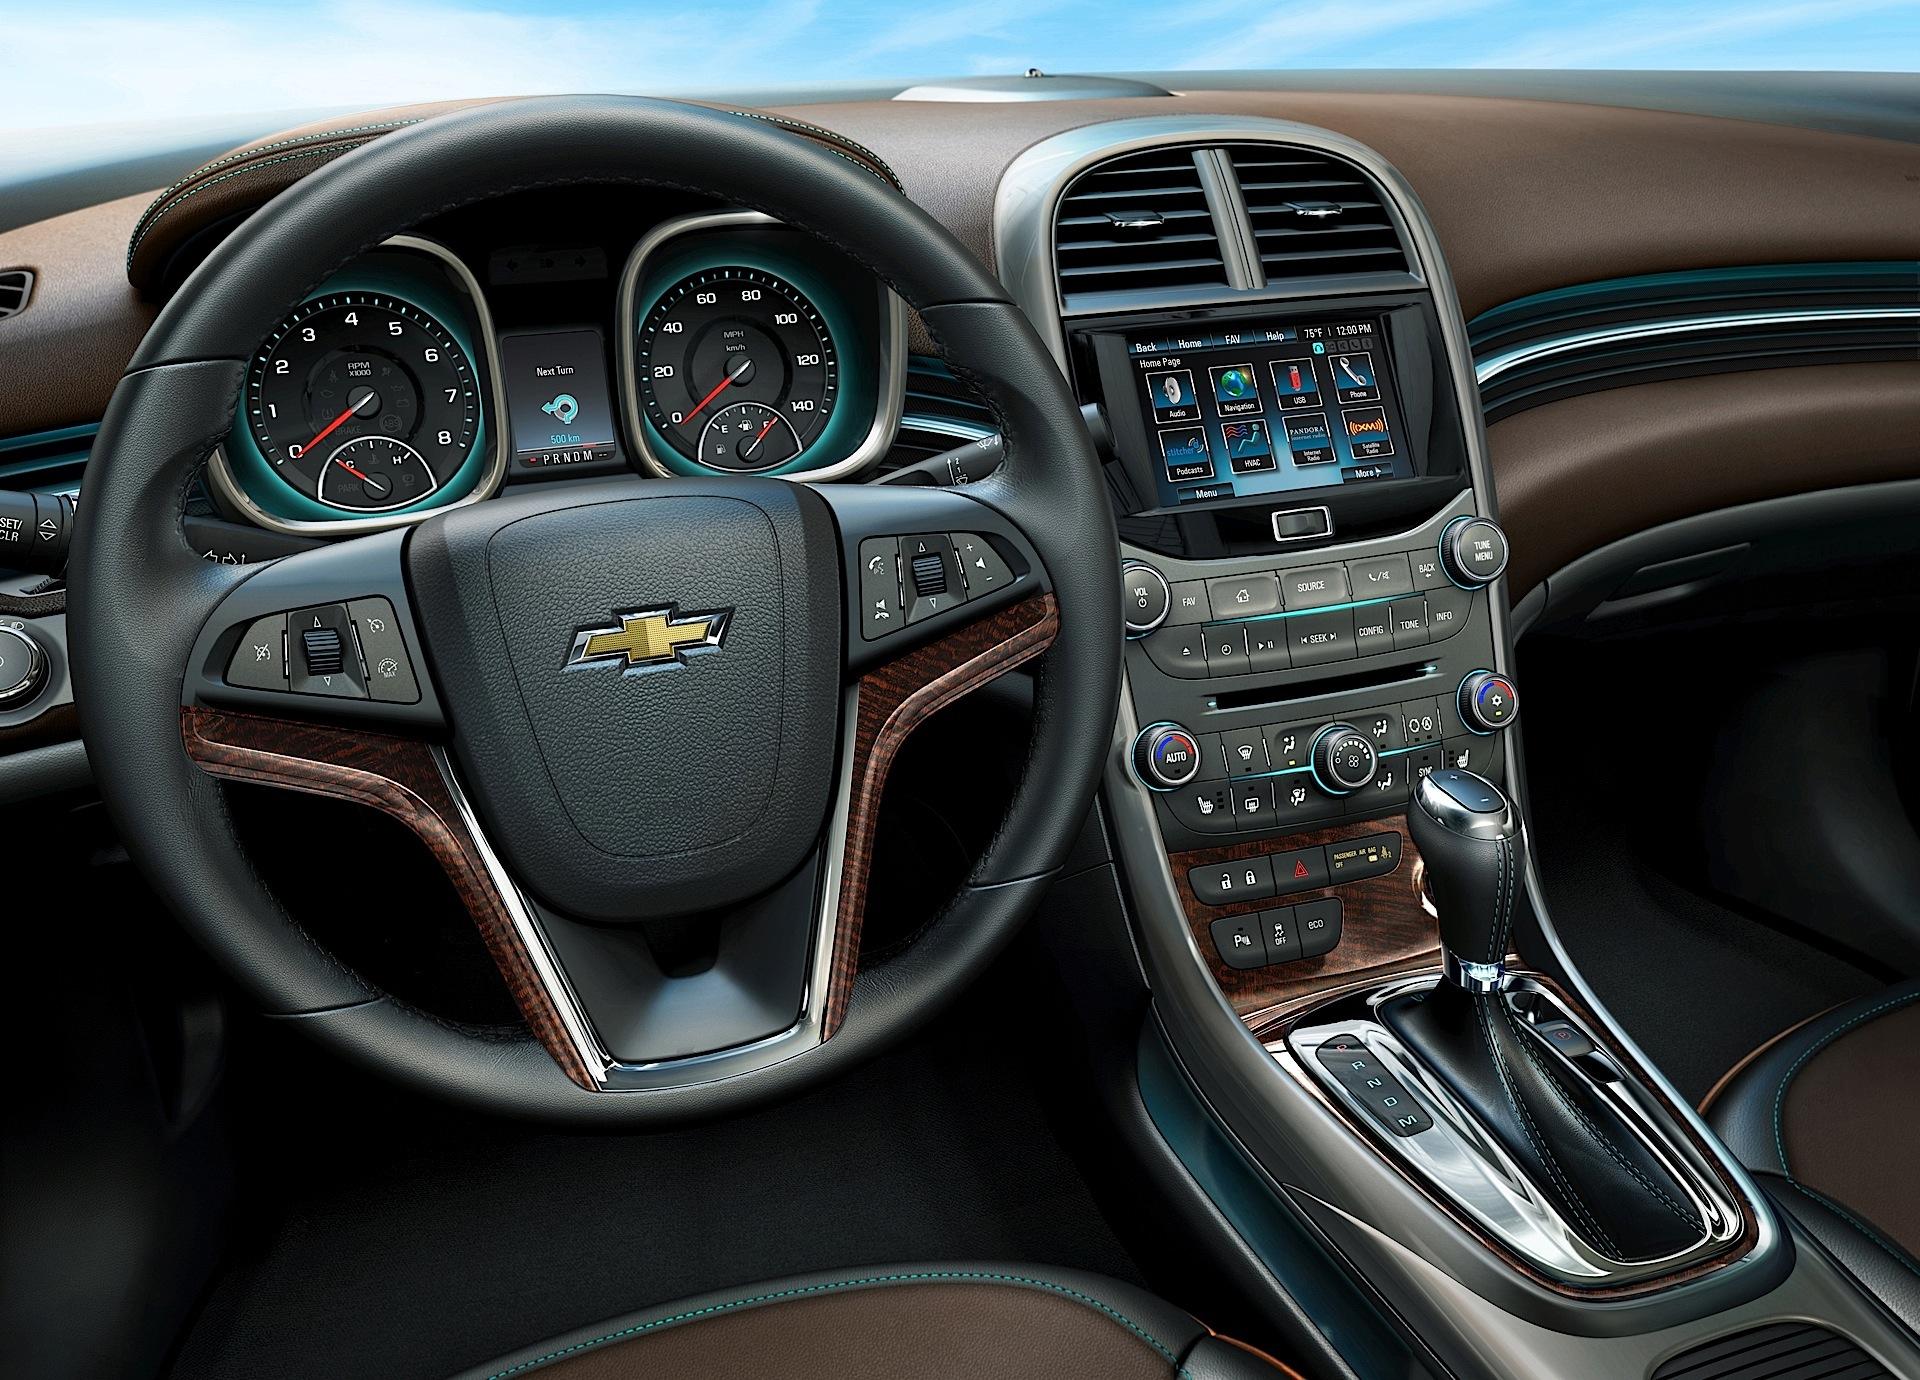 Chevrolet Malibu Specs Photos 2012 2013 2014 2015 2016 Autoevolution